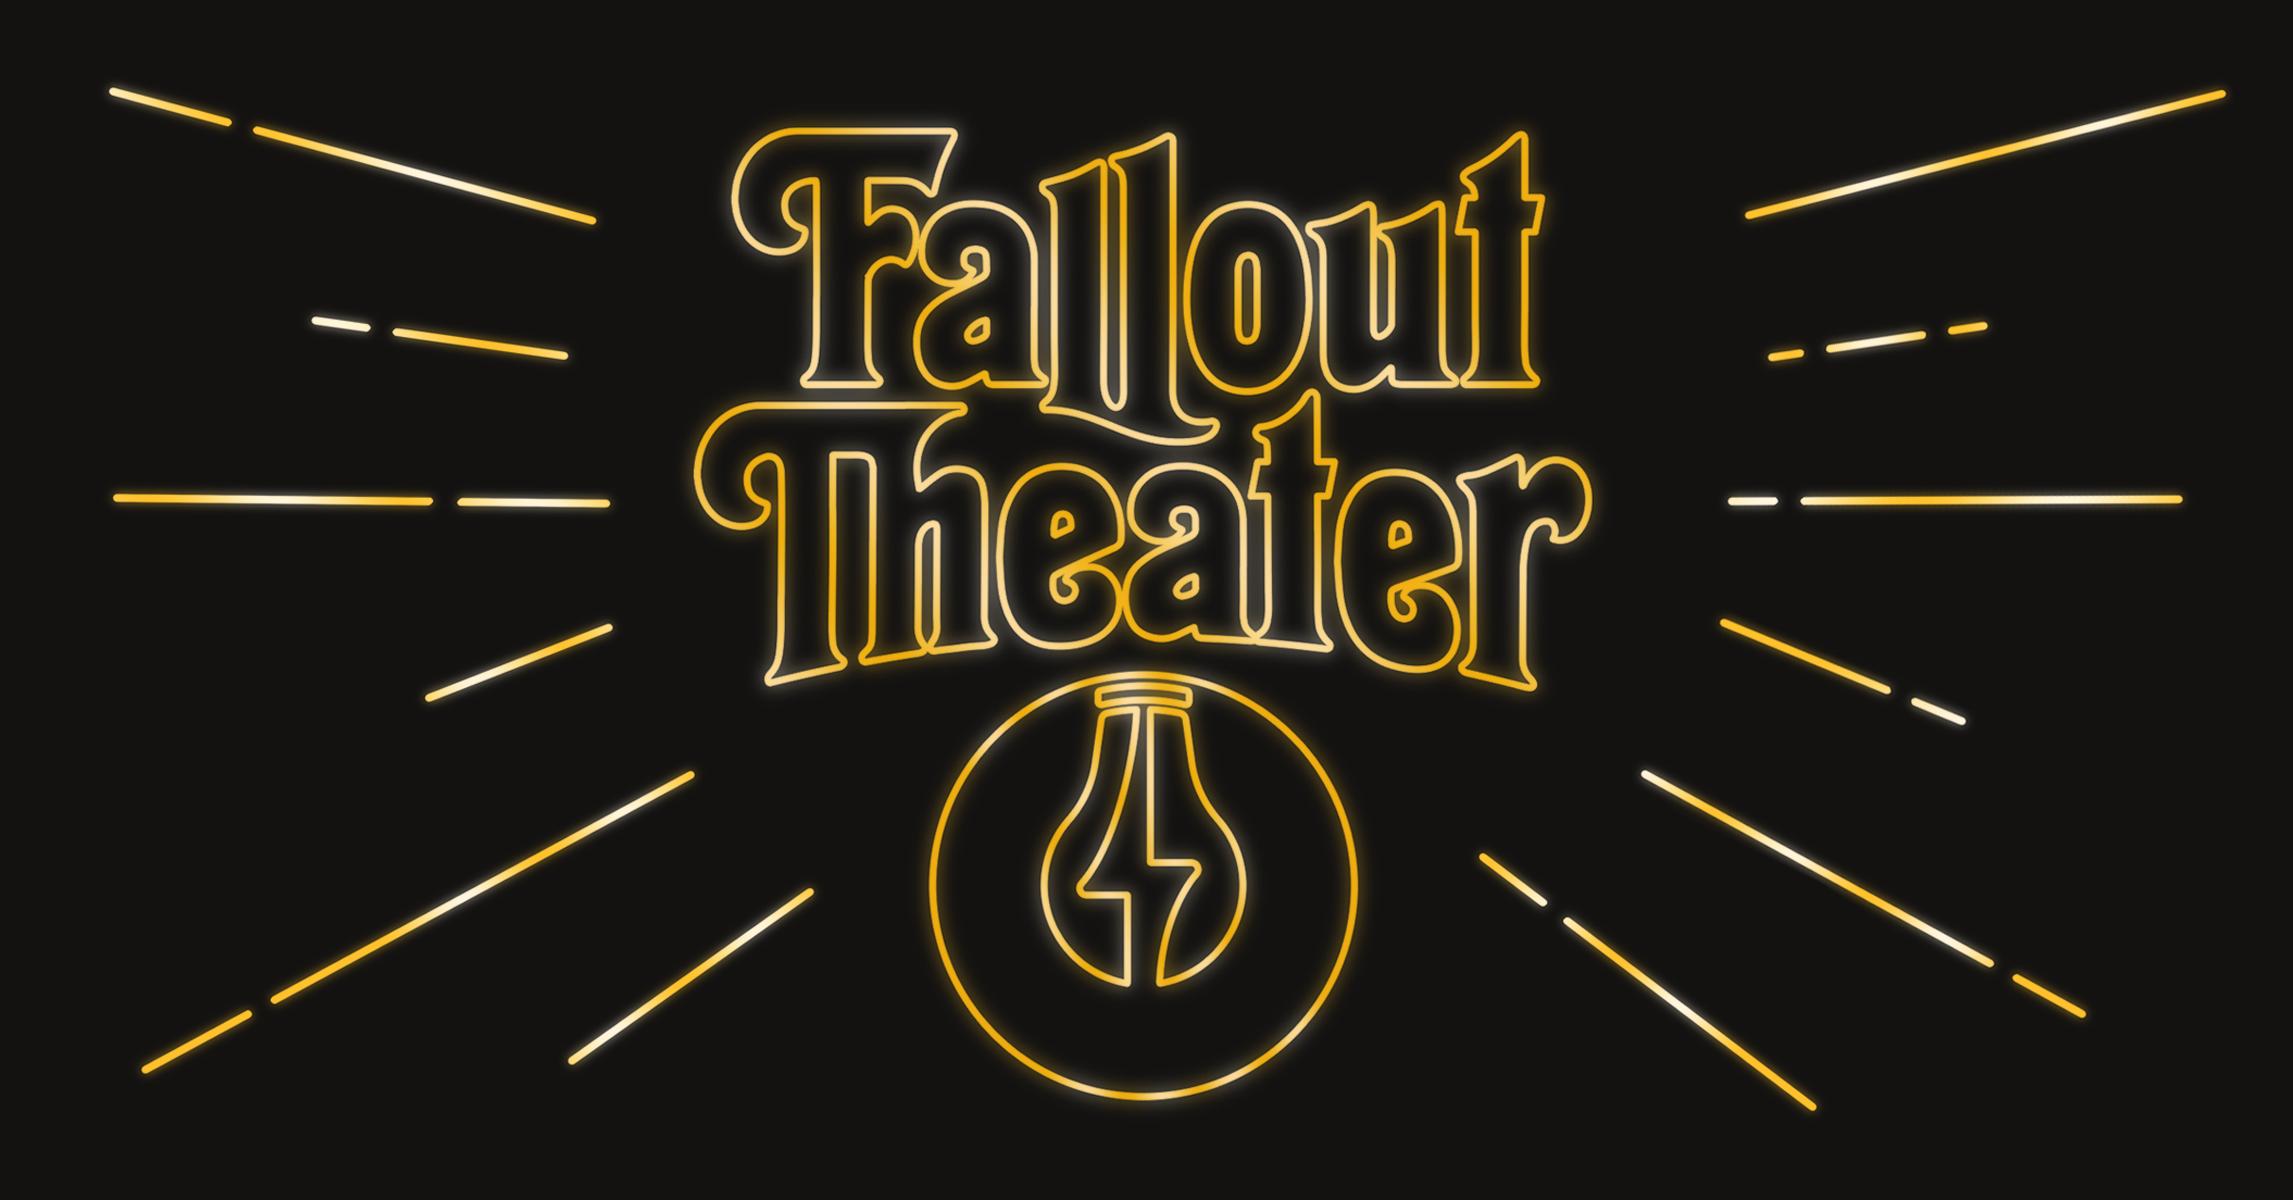 fallout-theater-austin-tx-1.jpg